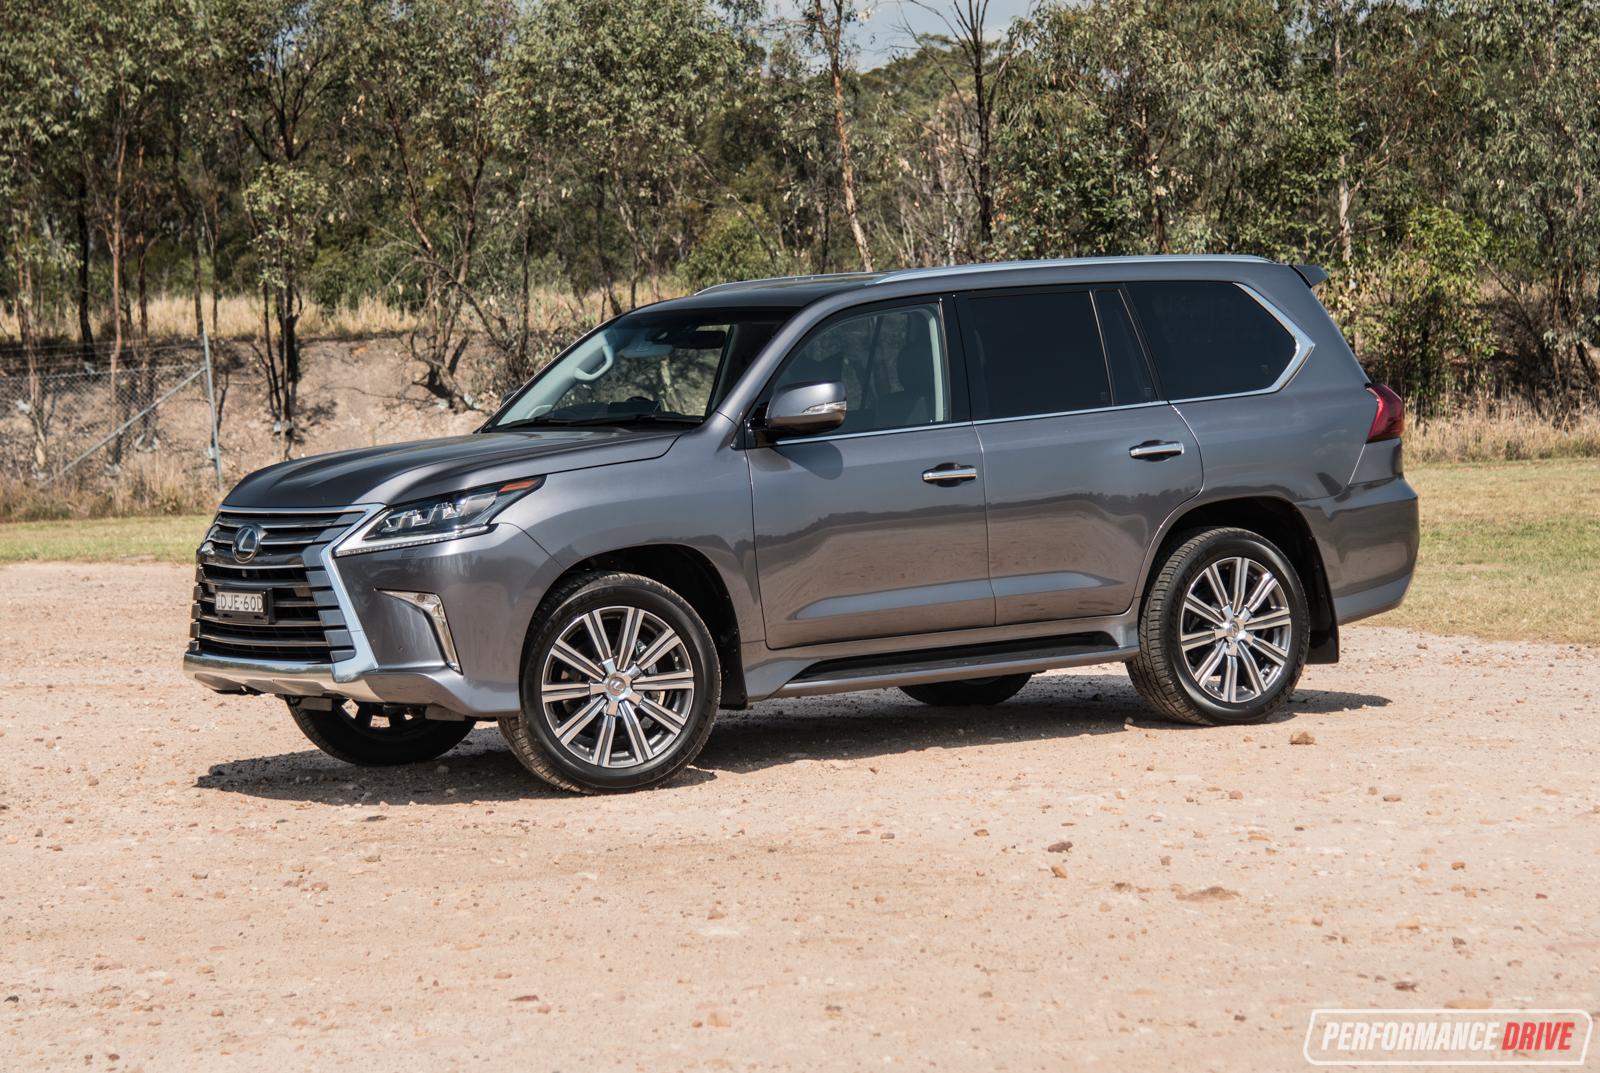 2017 Lexus Lx570 Review Video Performancedrive